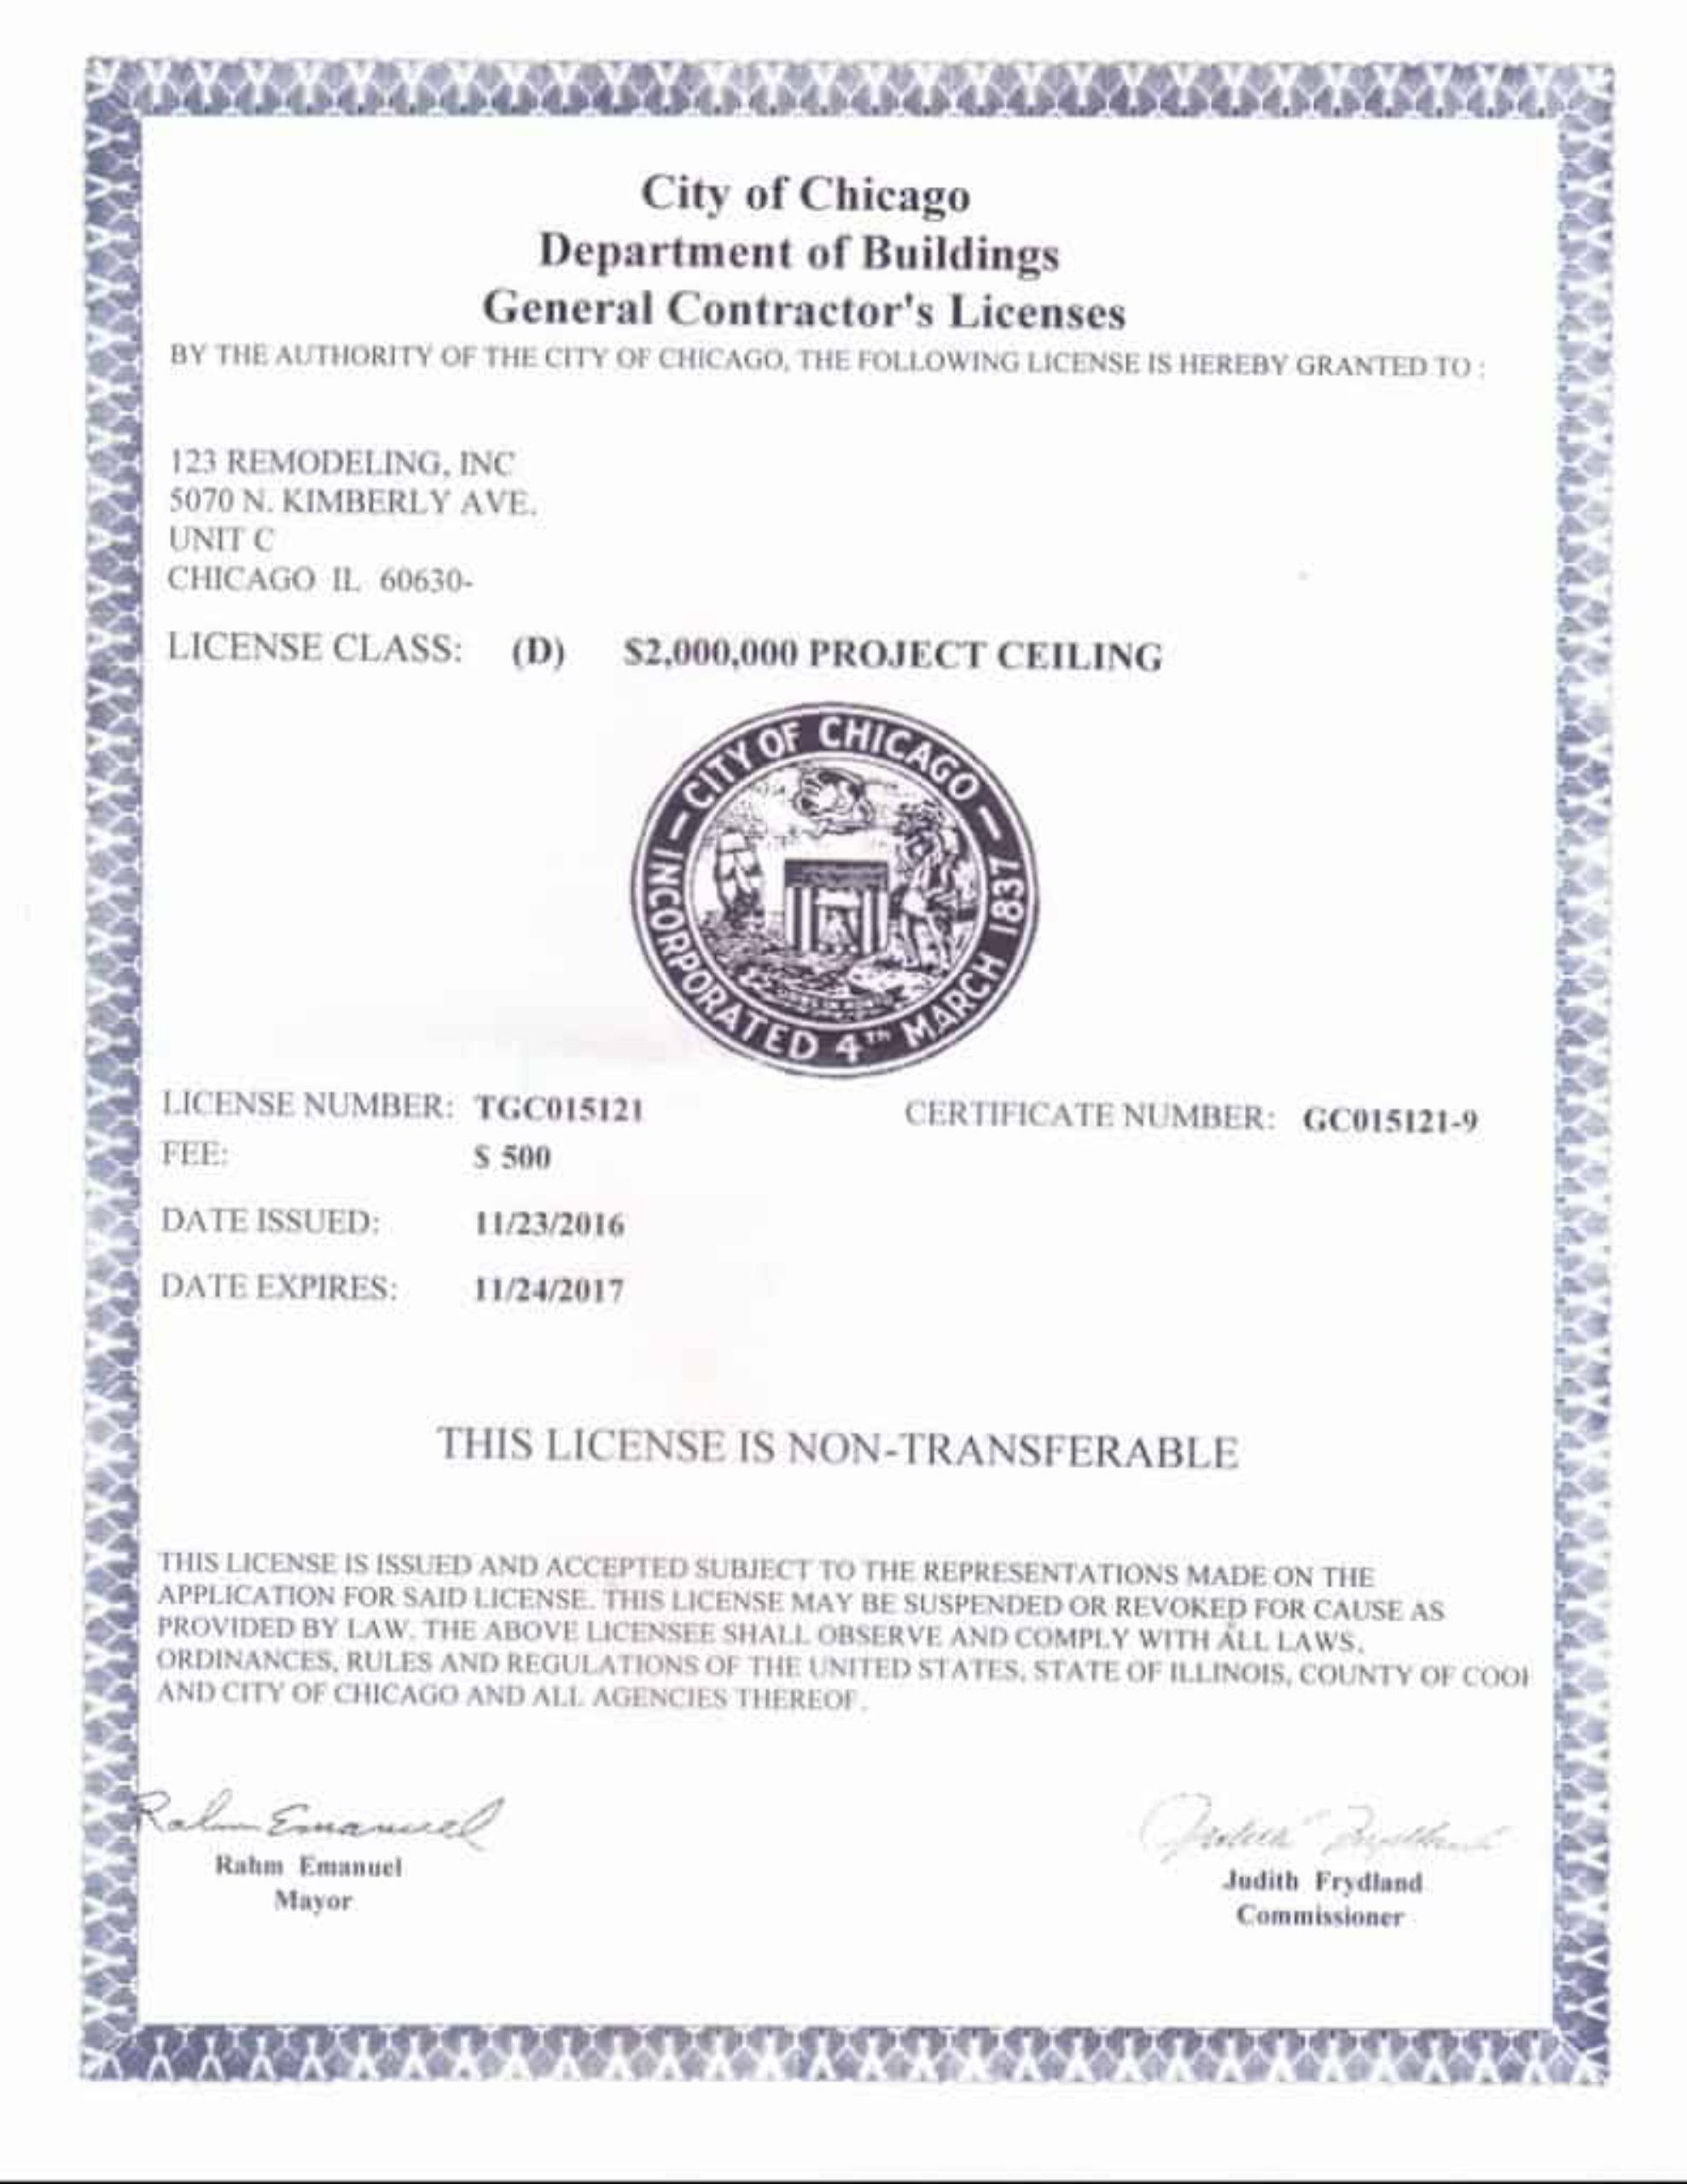 General Contractor License 2016-2017